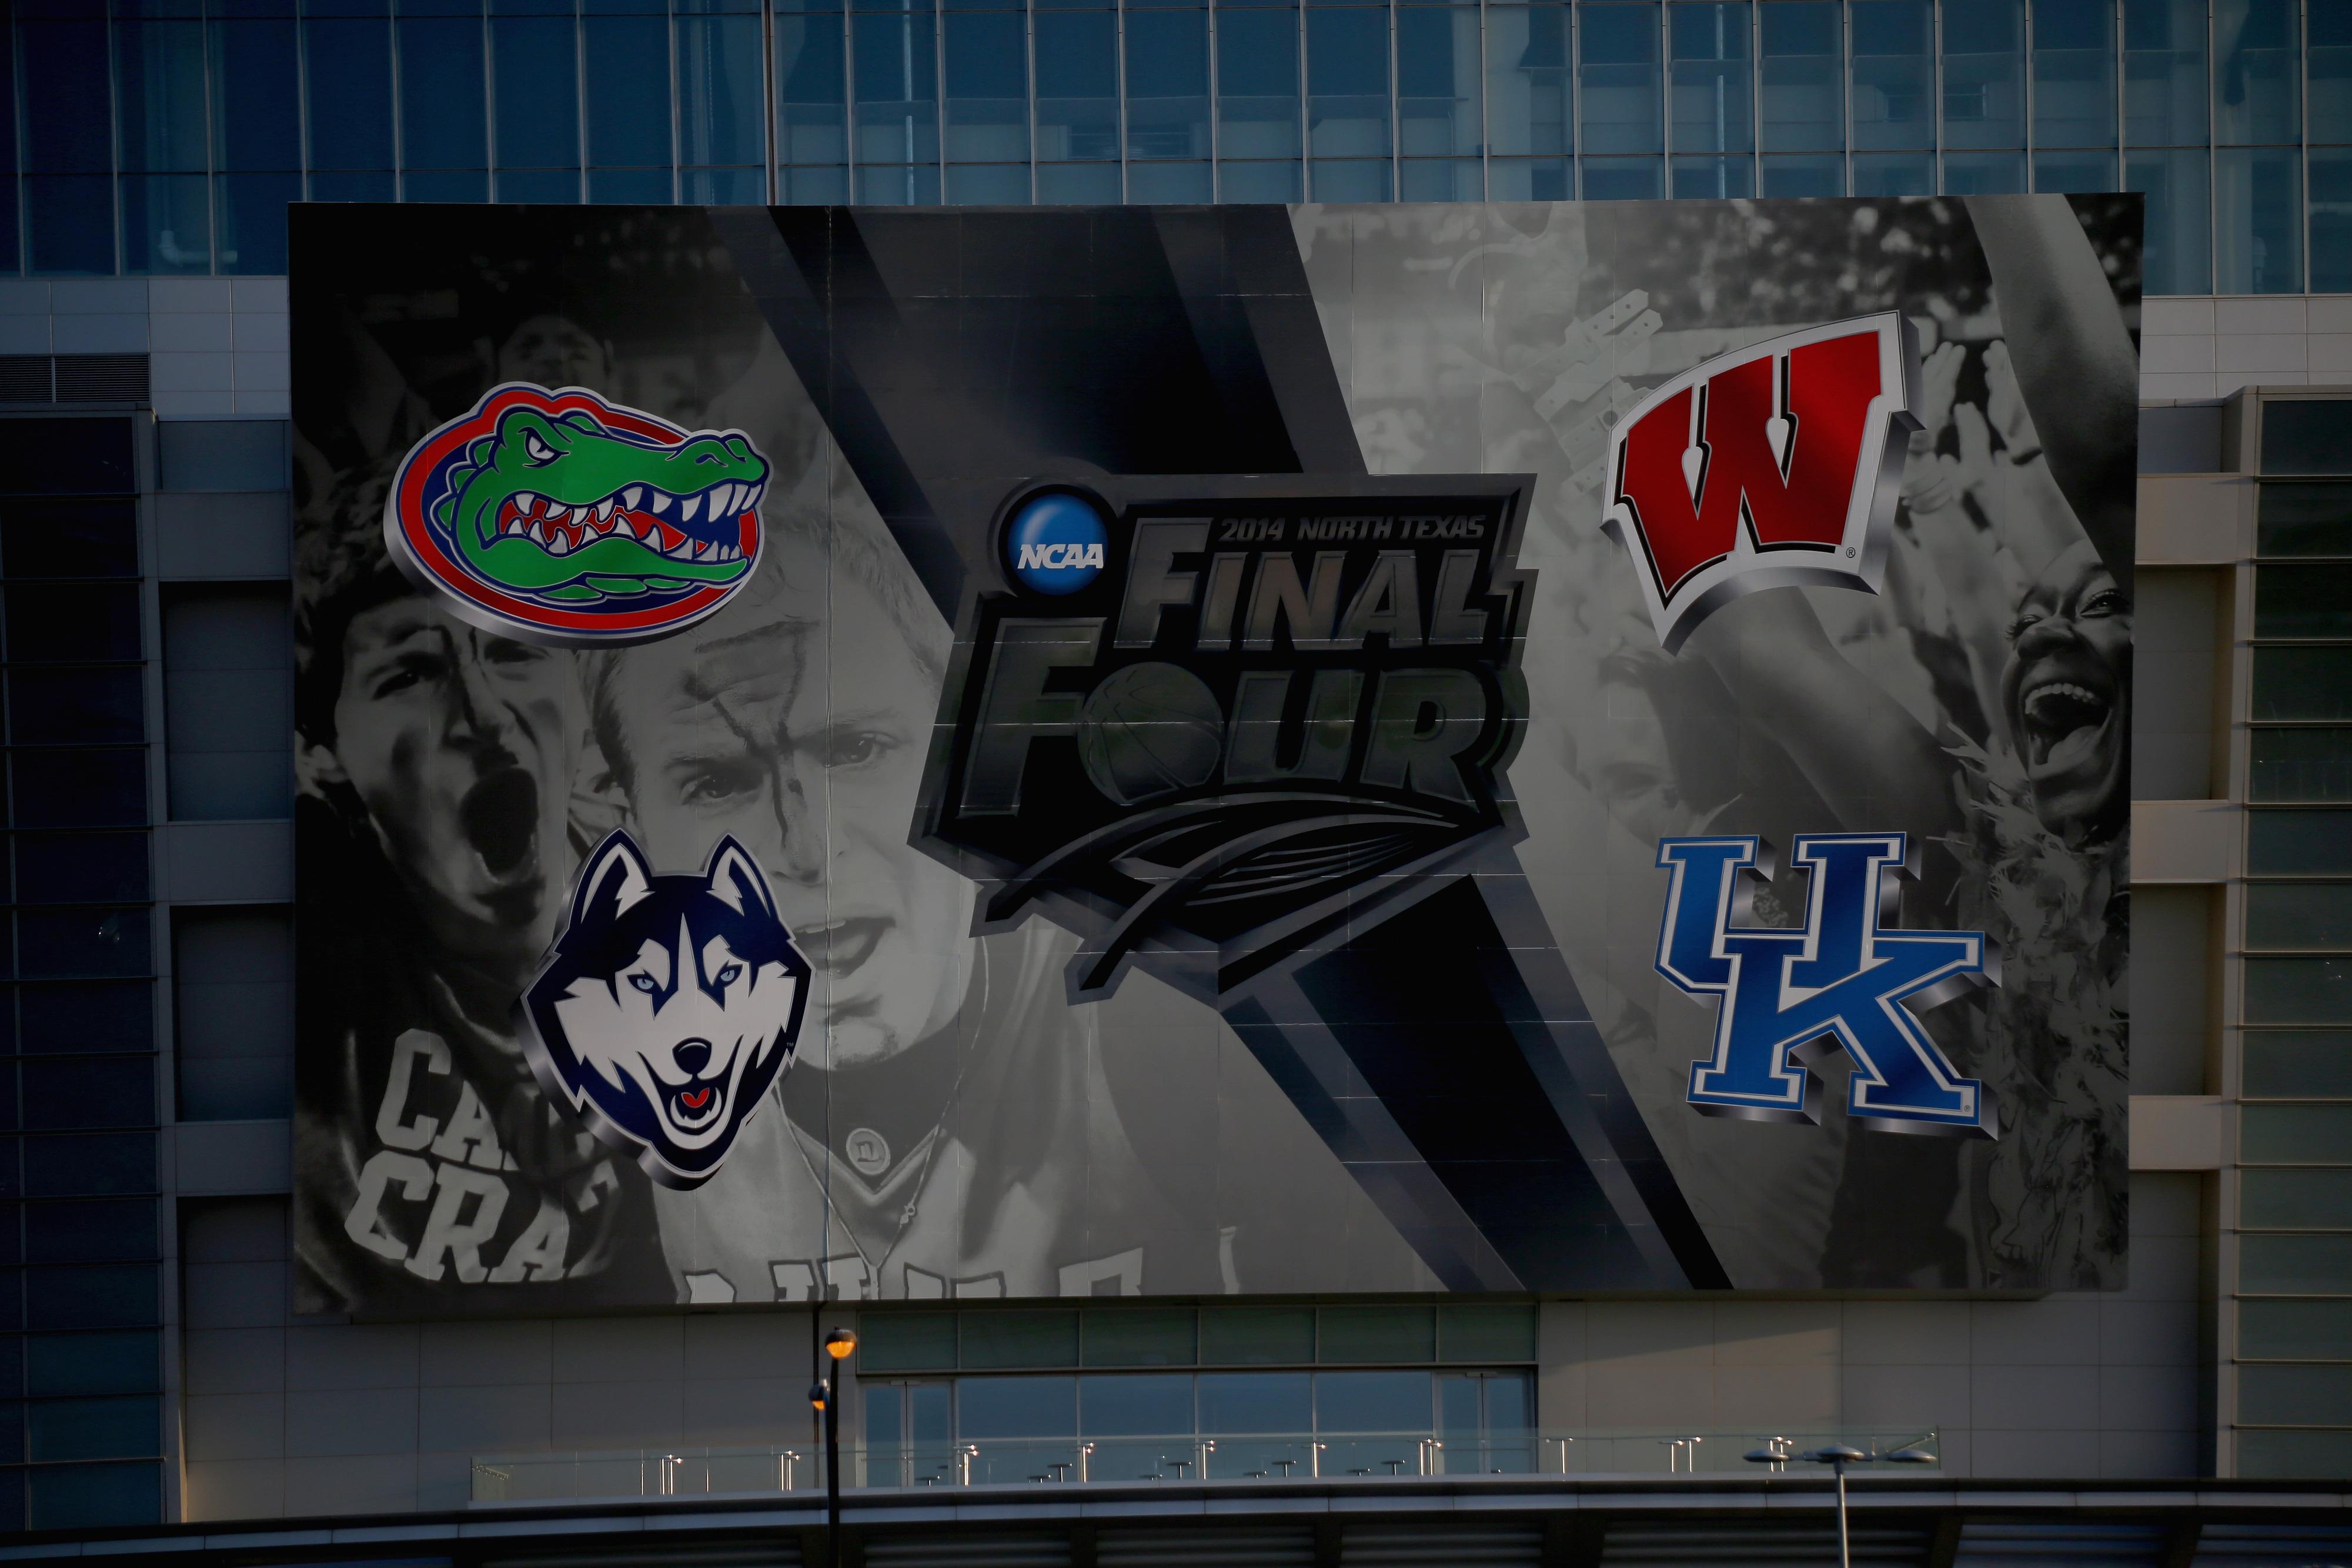 NCAA Tournament 2014: Final Four tips off Saturday night in Dallas